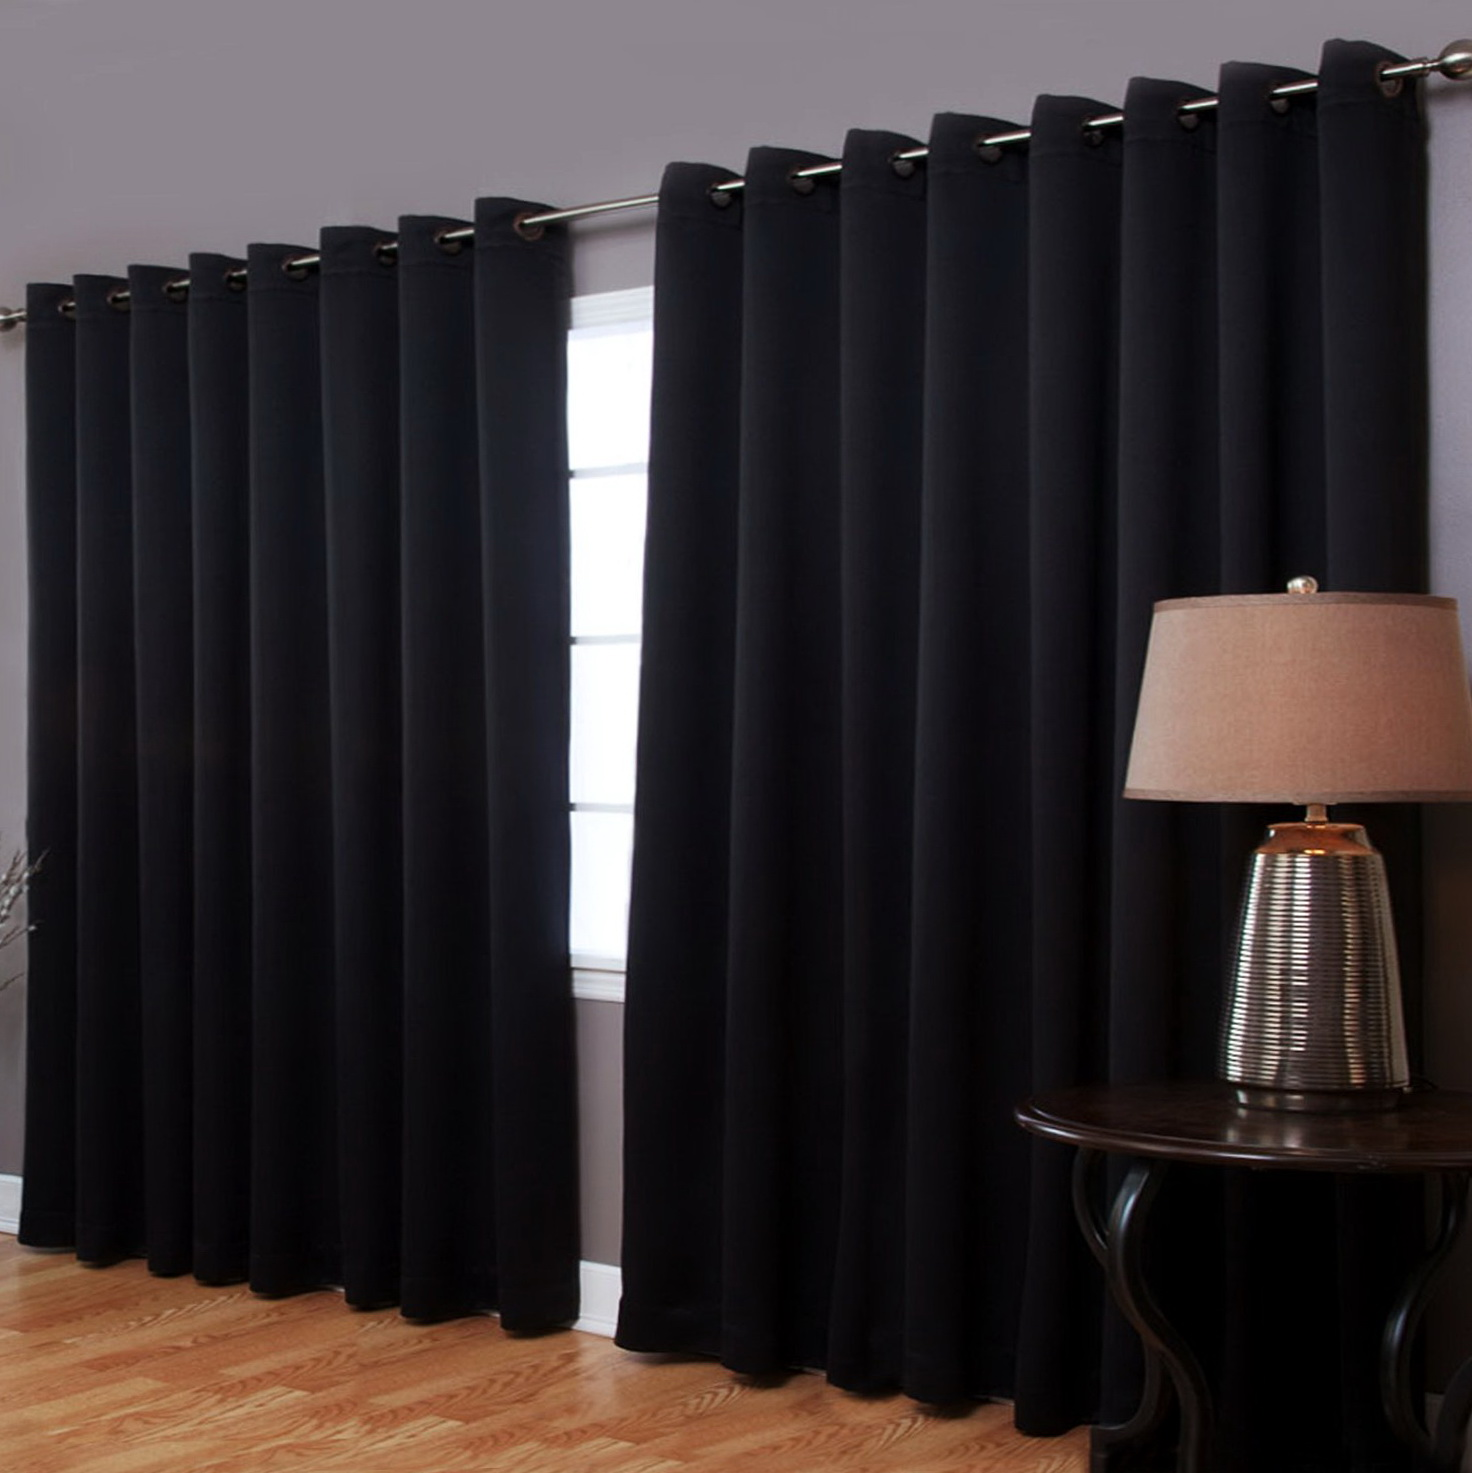 96 Inch Blackout Curtains Home Design Ideas